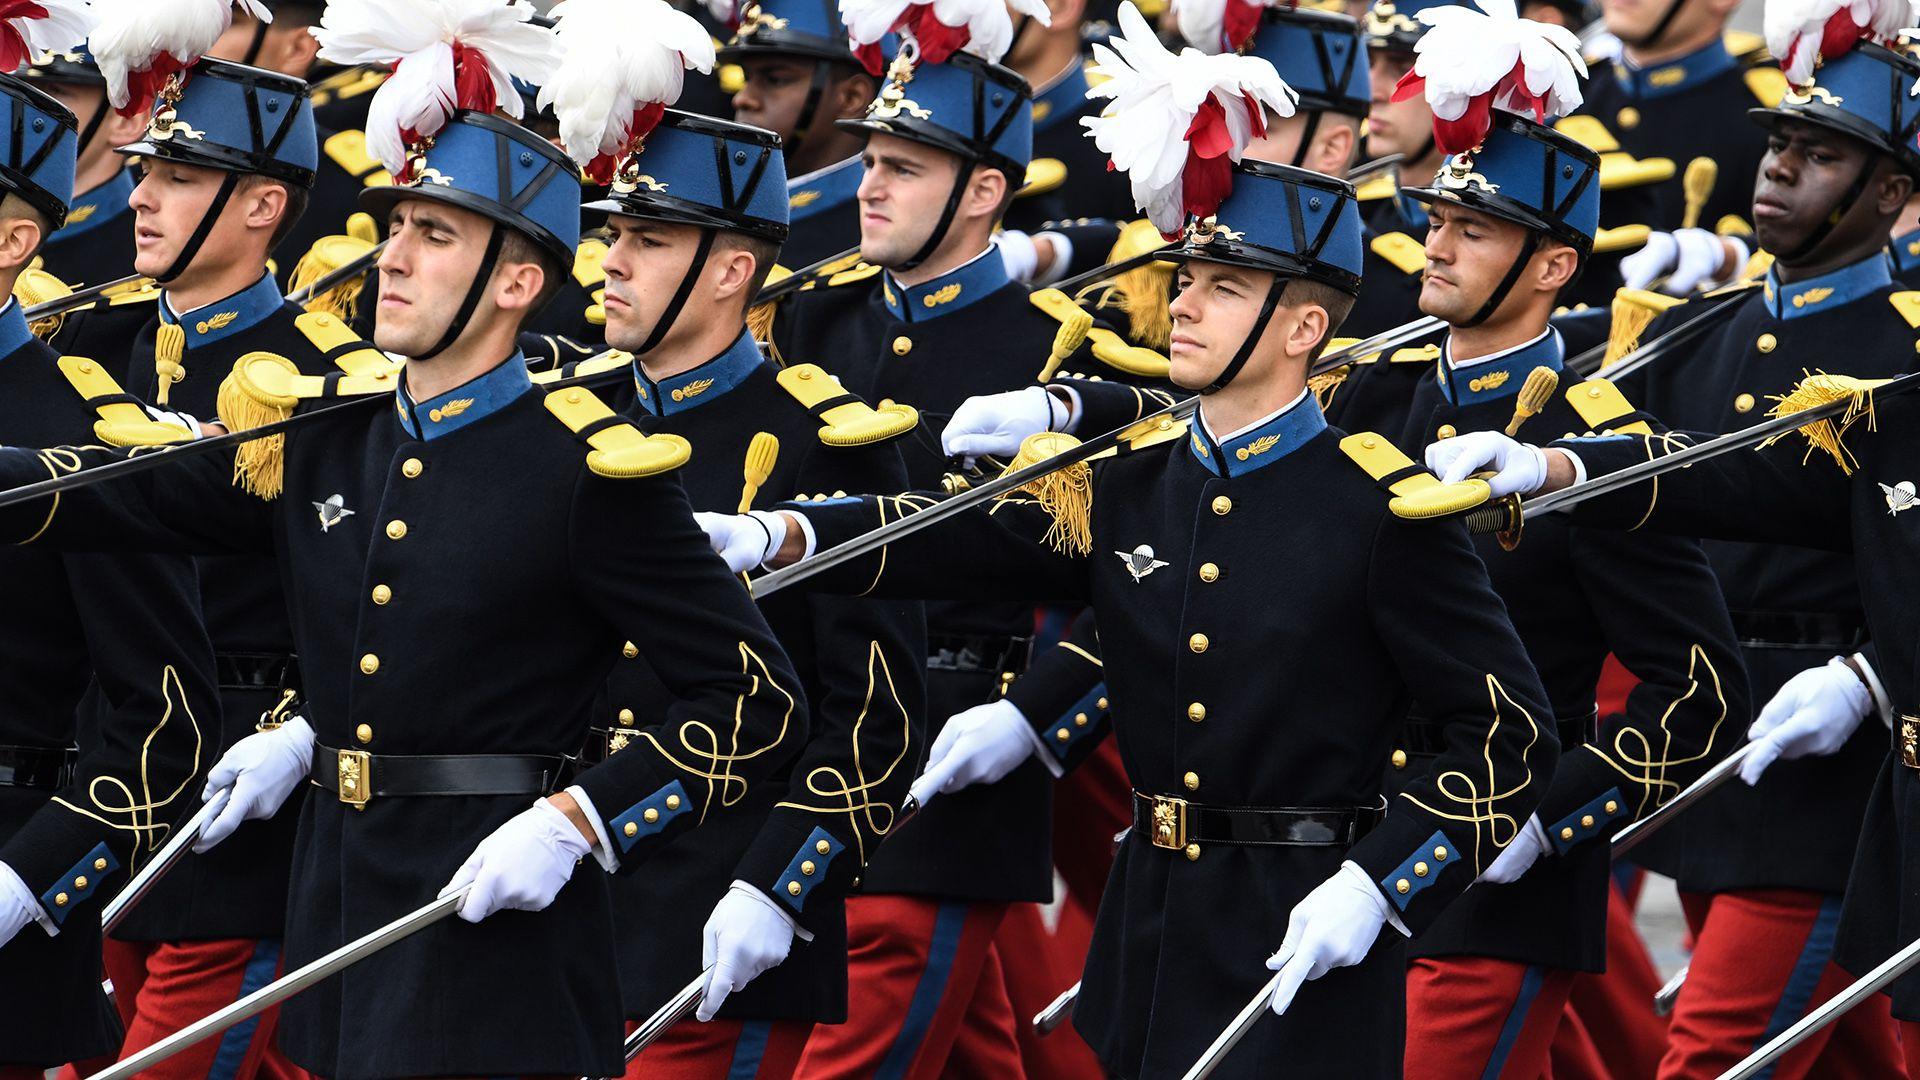 Alumnos de la Ecole Speciale Militaire de Saint-Cyr participan del desfile (AFP)